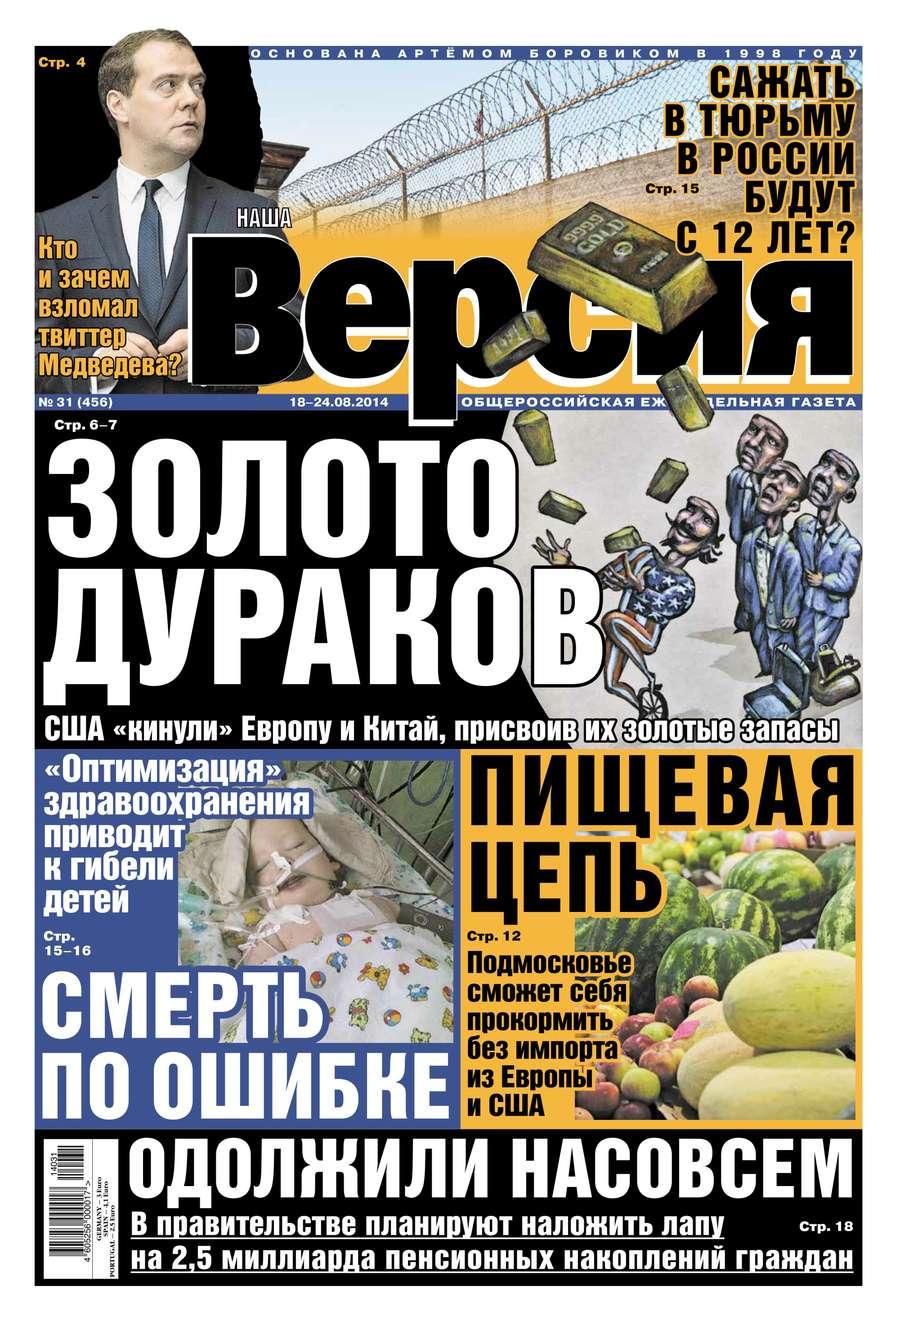 Редакция газеты Наша Версия Наша версия 31-2014 цена и фото